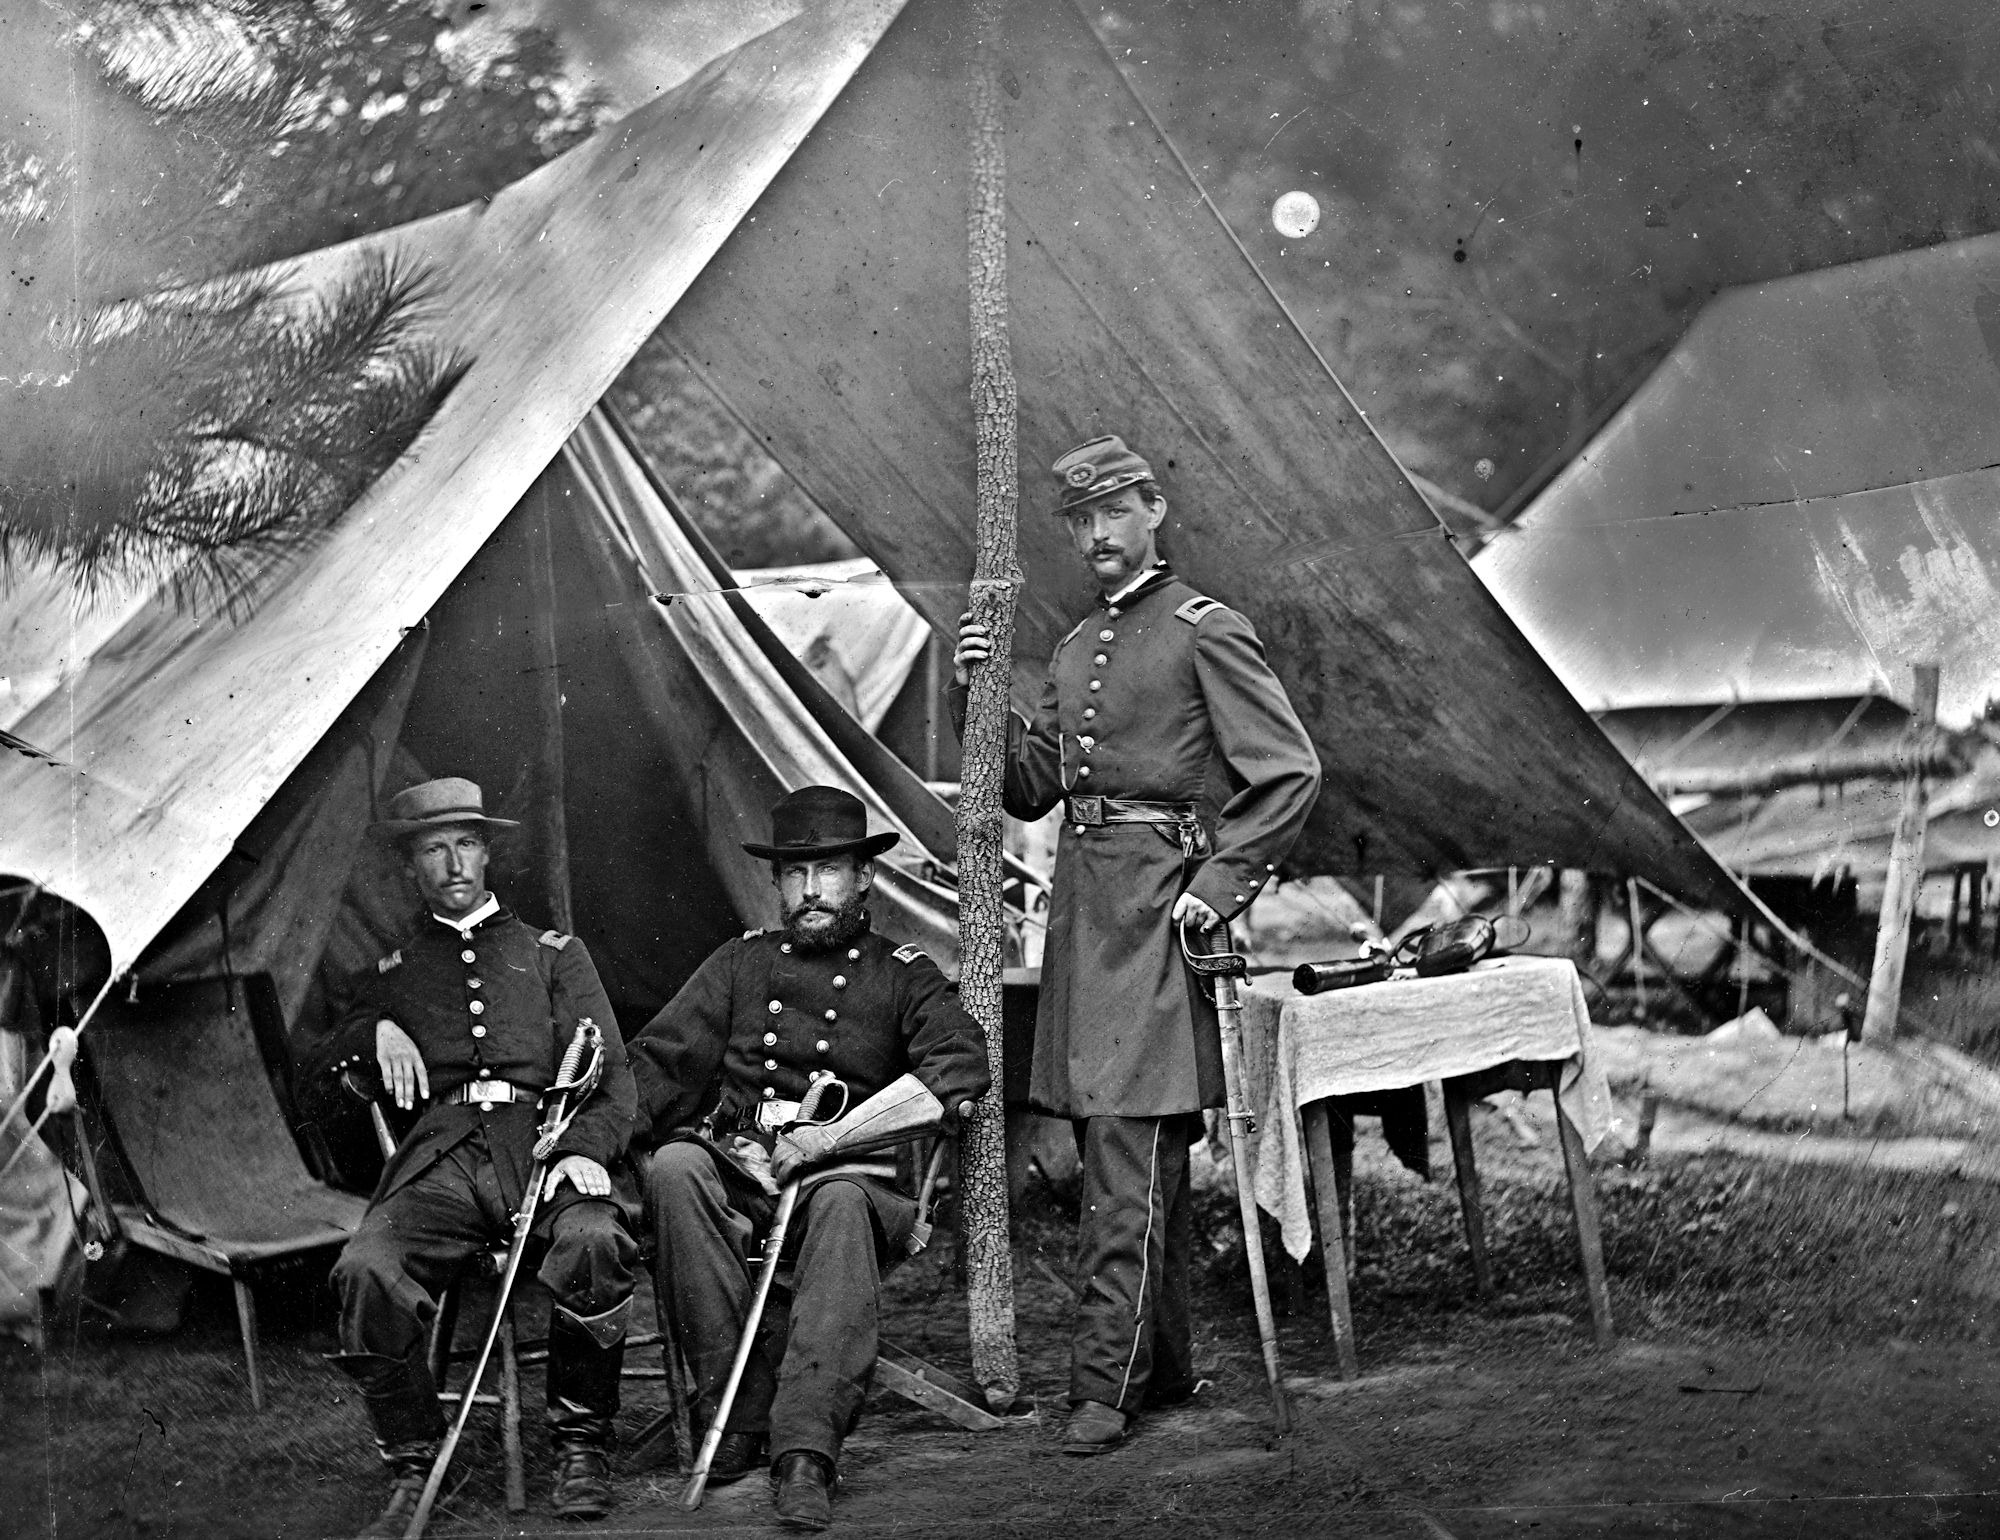 Lincoln S Favorite Photographer Illuminates Post Civil War